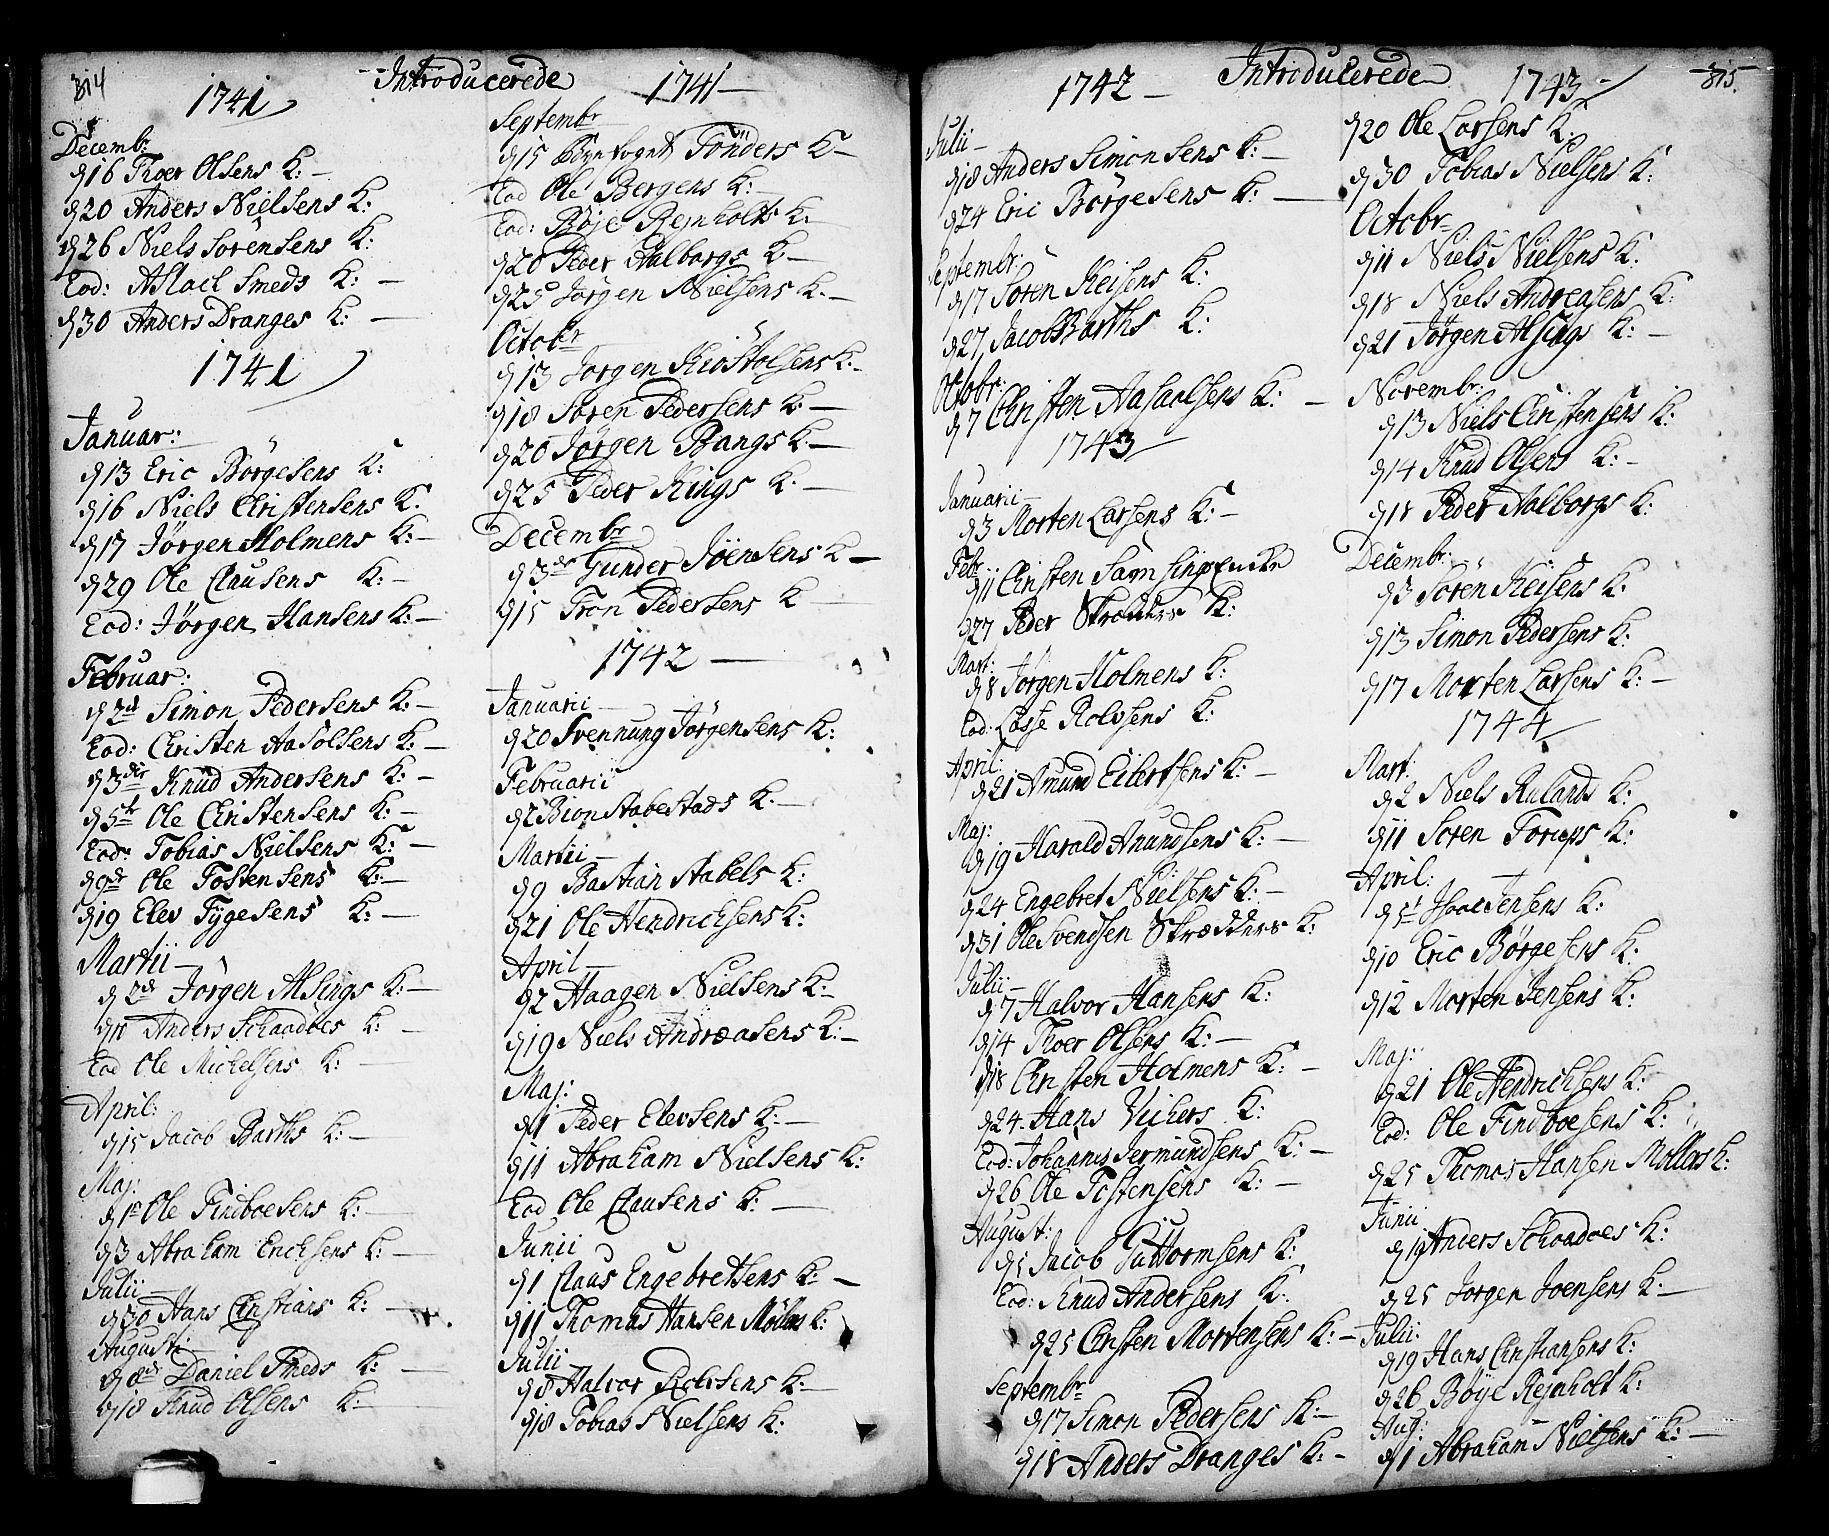 SAKO, Kragerø kirkebøker, F/Fa/L0001: Ministerialbok nr. 1, 1702-1766, s. 314-315